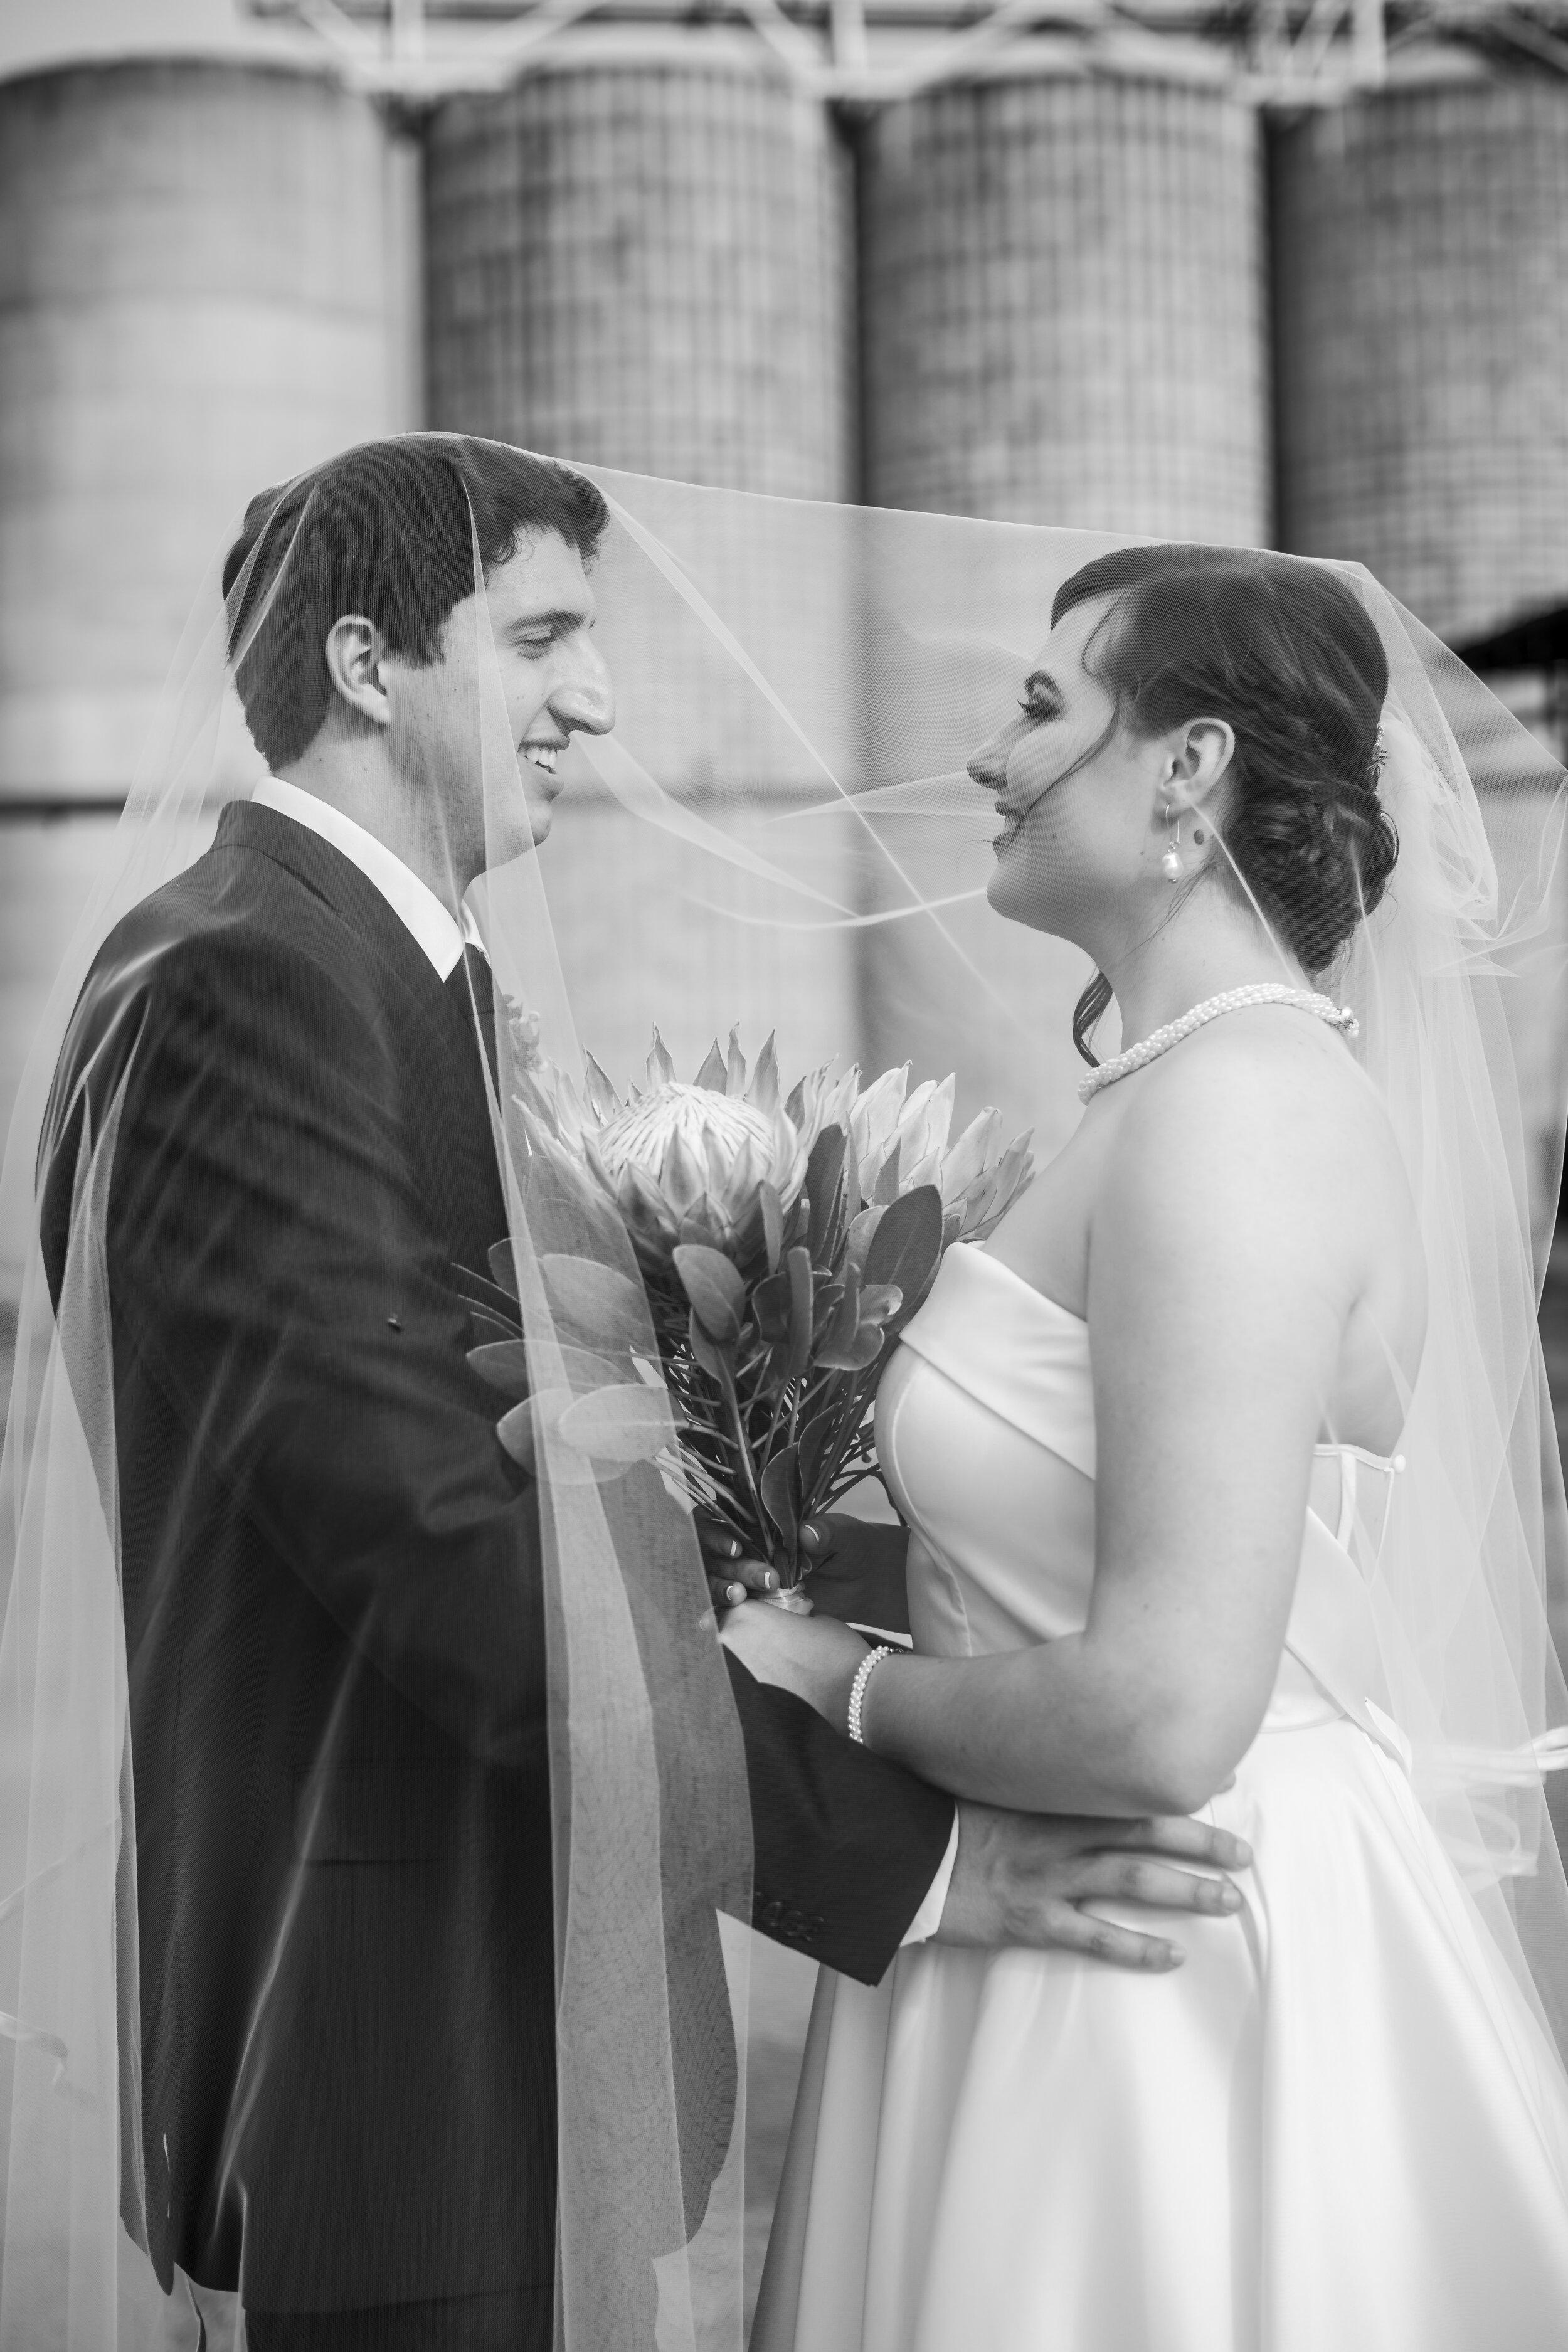 Wedding Photos - Final Edits - Post Ceremony-31.jpg